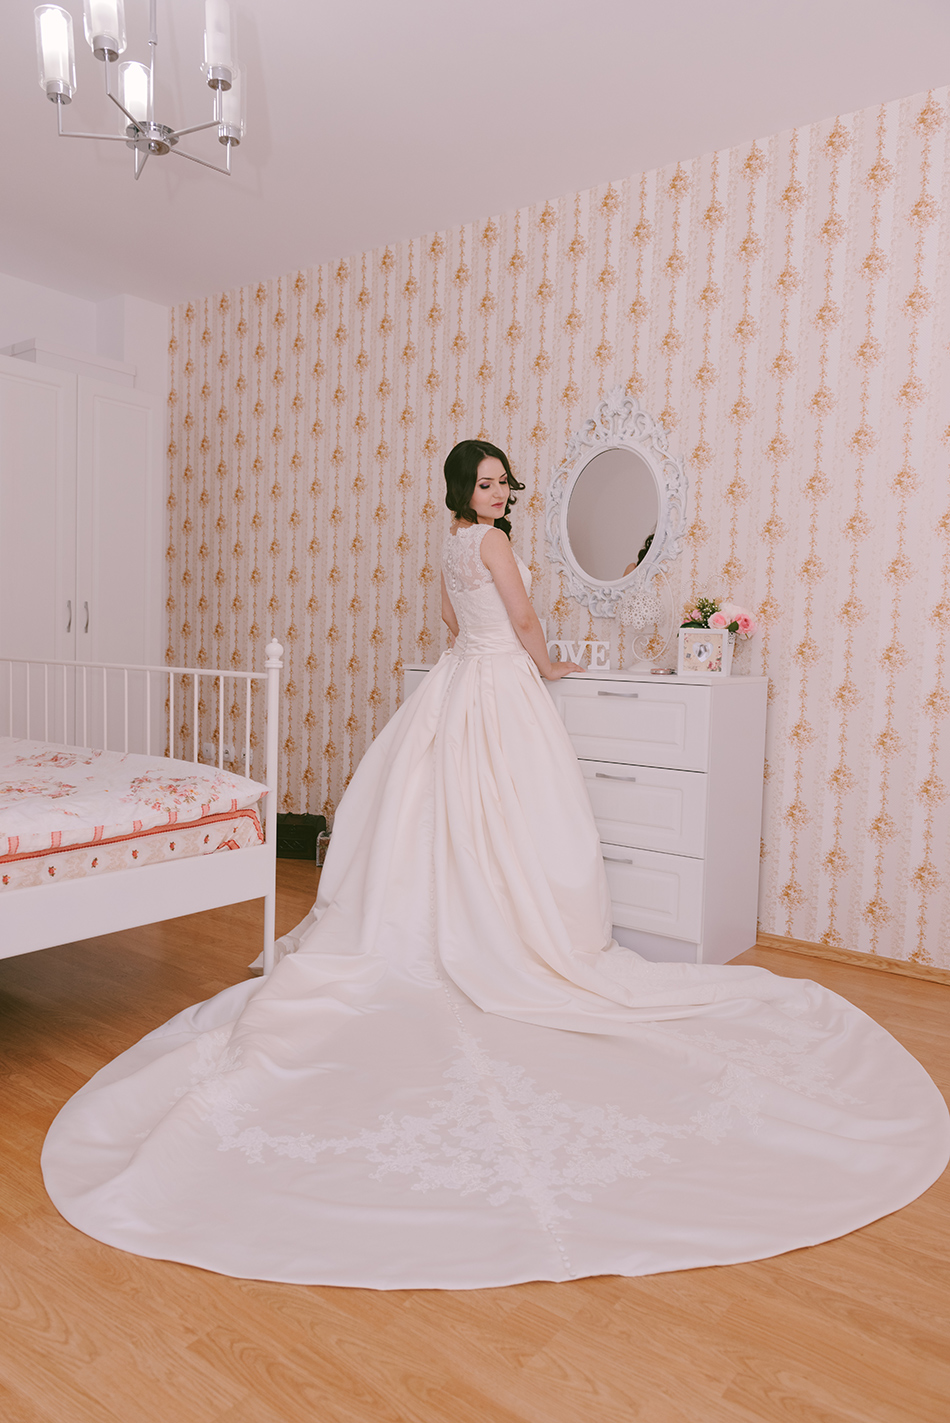 AD Passion Photography | astrid-madalin-nunta-rin-grand-hotel-bucuresti-fotograf-profesionist_0025 | Adelin, Dida, fotograf profesionist, fotograf de nunta, fotografie de nunta, fotograf Timisoara, fotograf Craiova, fotograf Bucuresti, fotograf Arad, nunta Timisoara, nunta Arad, nunta Bucuresti, nunta Craiova